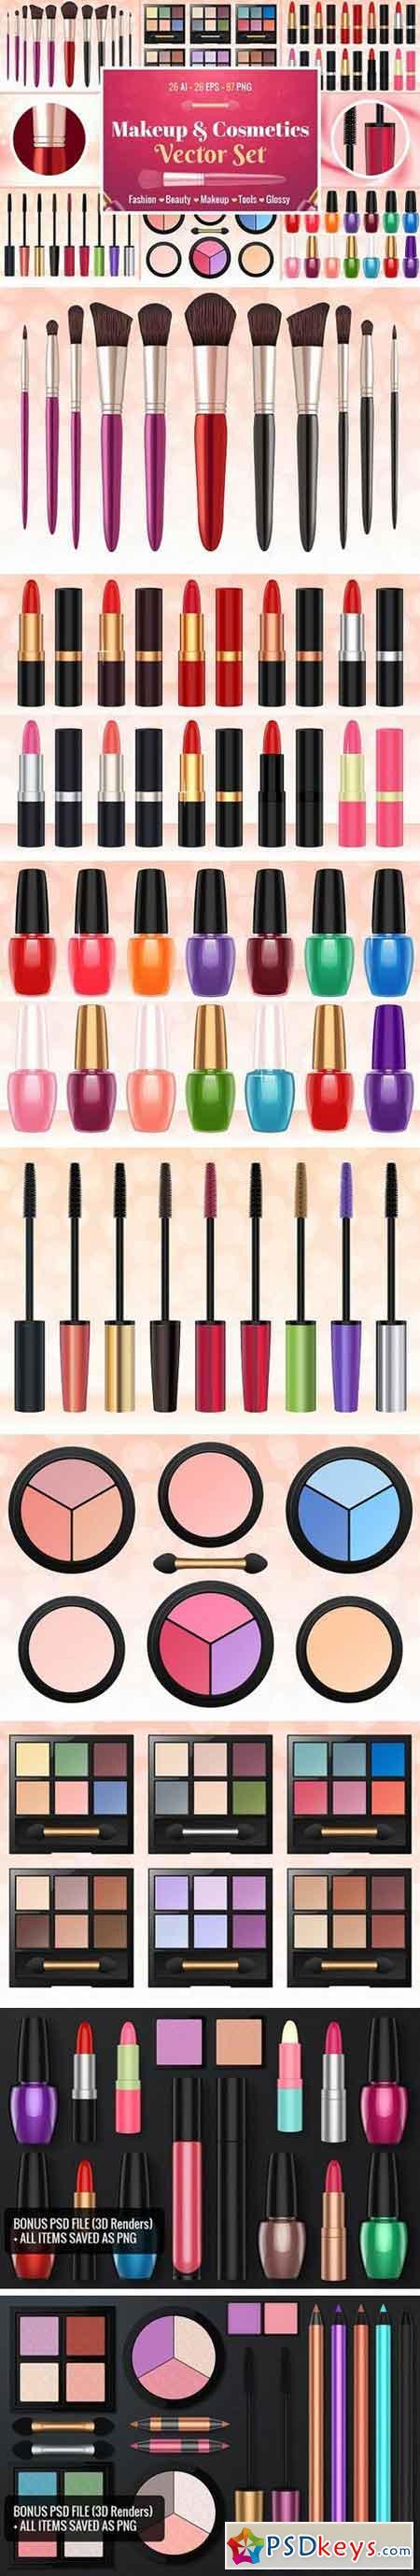 Makeup & Cosmetics Vector Set 1783247